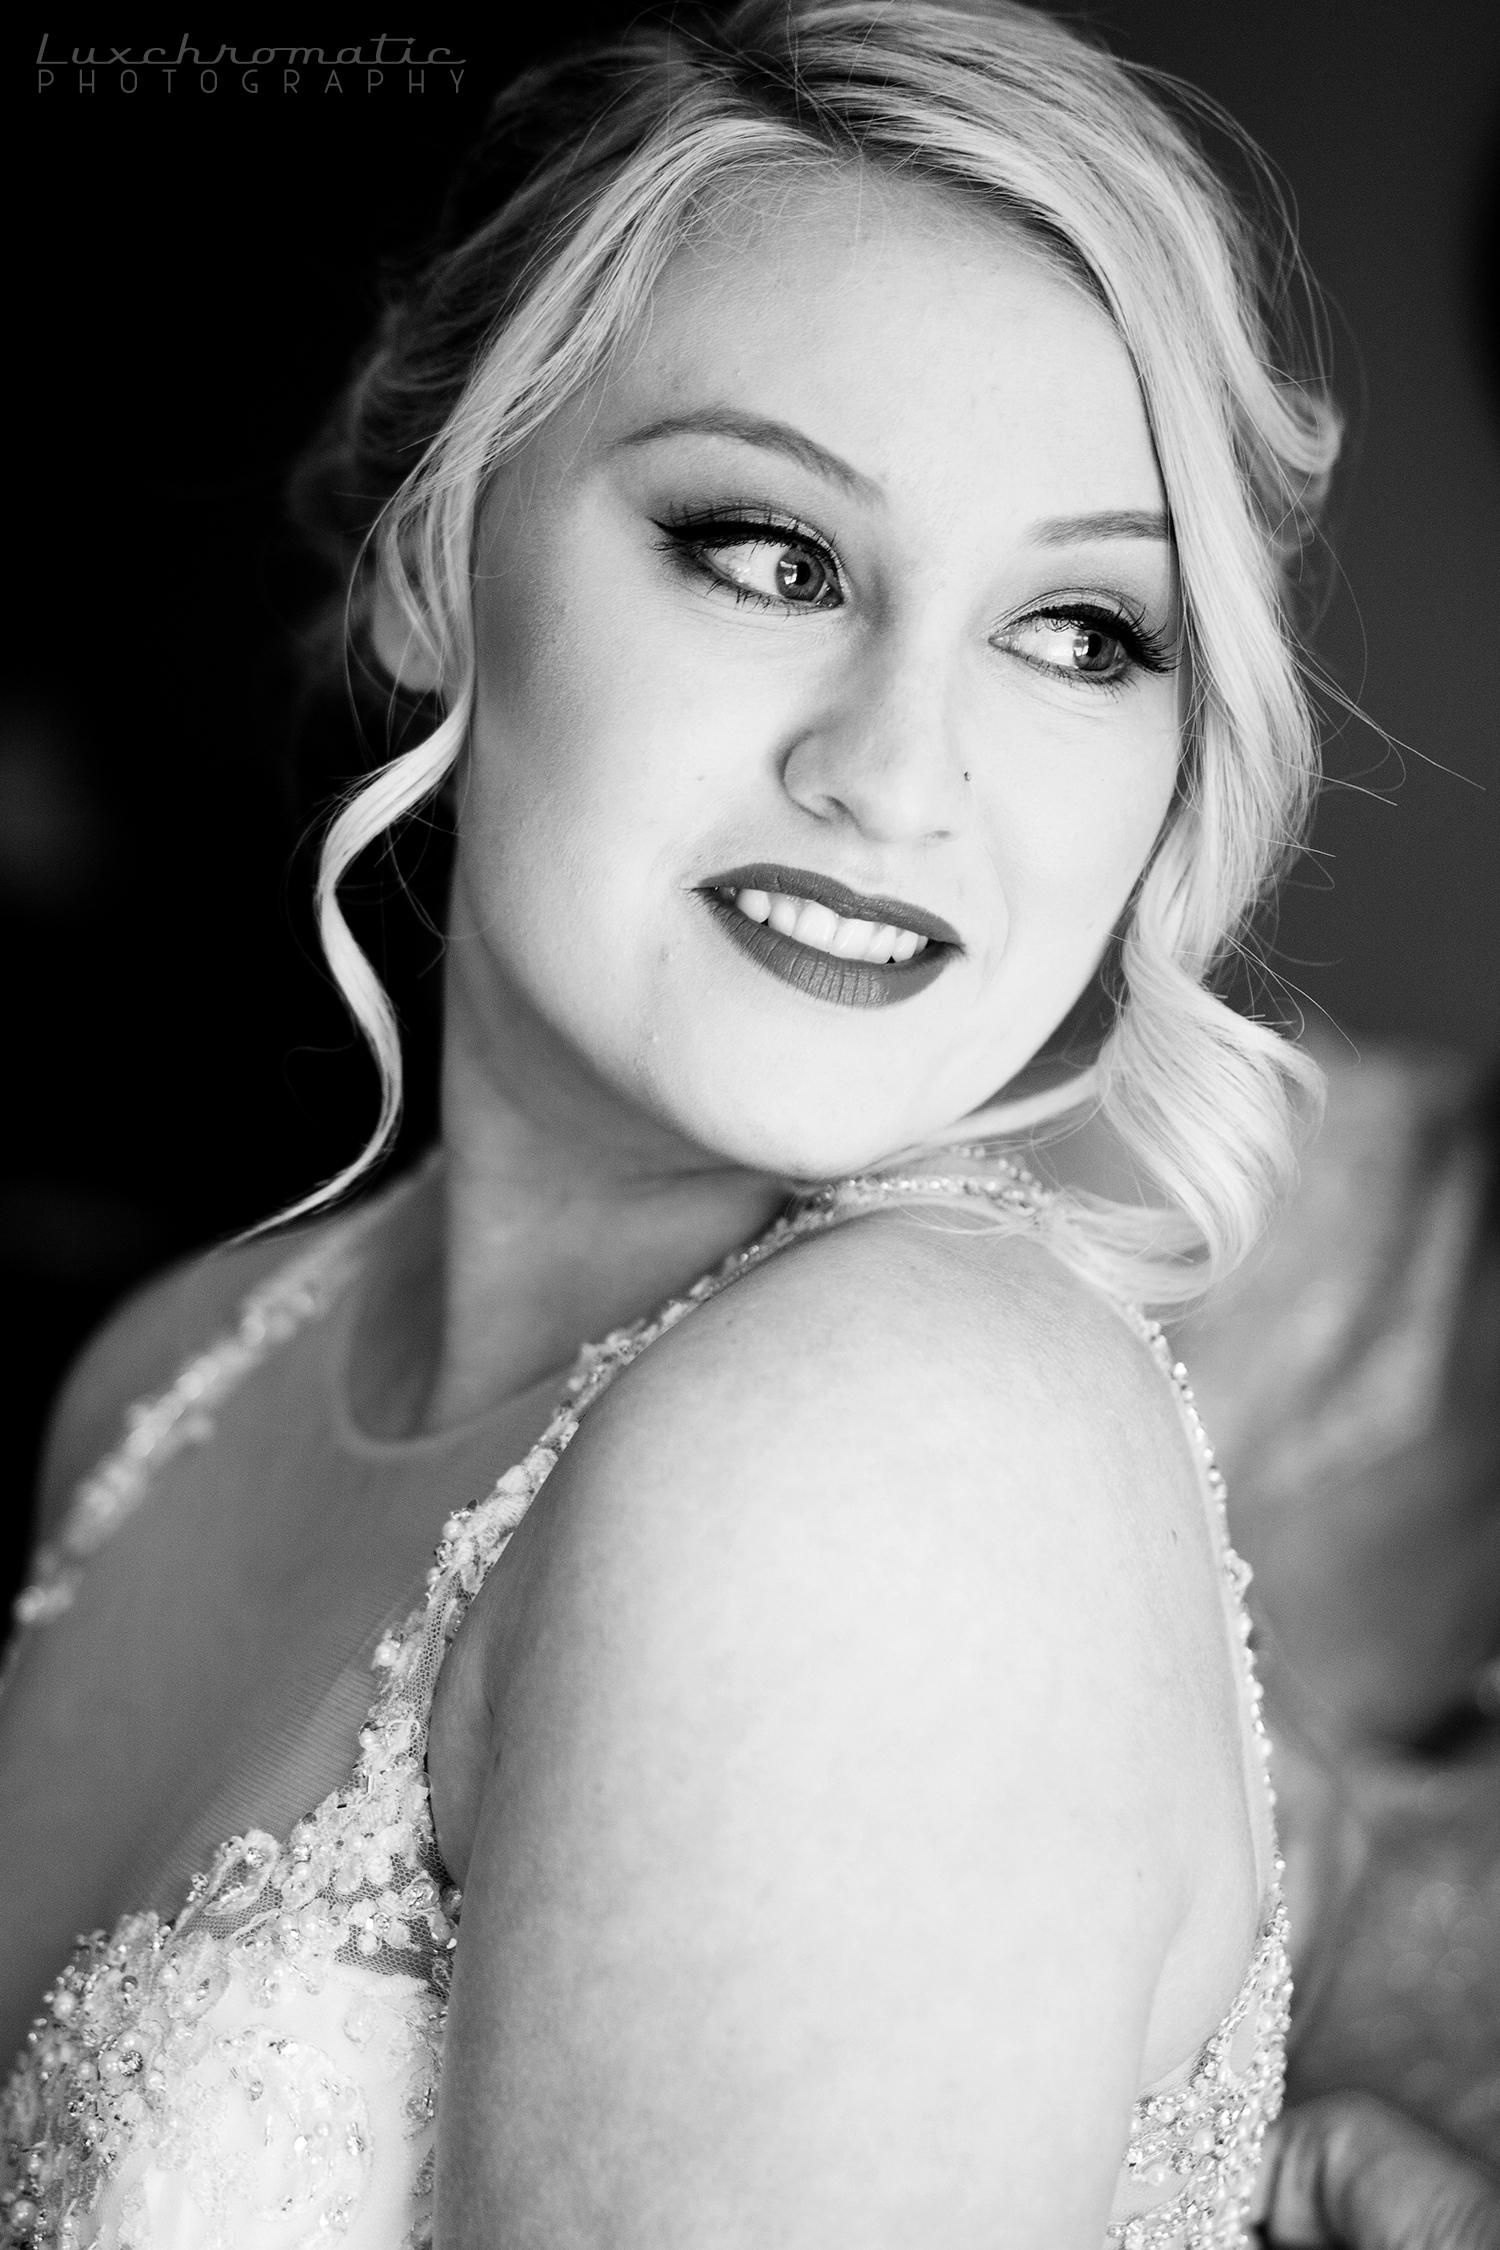 052017_Natalie_Travis-1031b-San-Francisco-Bay-Area-Fremont-East-Bay-Wedding-Church-Hotel-Silicon-Valley-Bride-Gown-Dress-Groom-Luxchromatic-Portrait-Sony-Alpha-a7Rii-Interfit-Profoto-Photographer-Photography.jpg